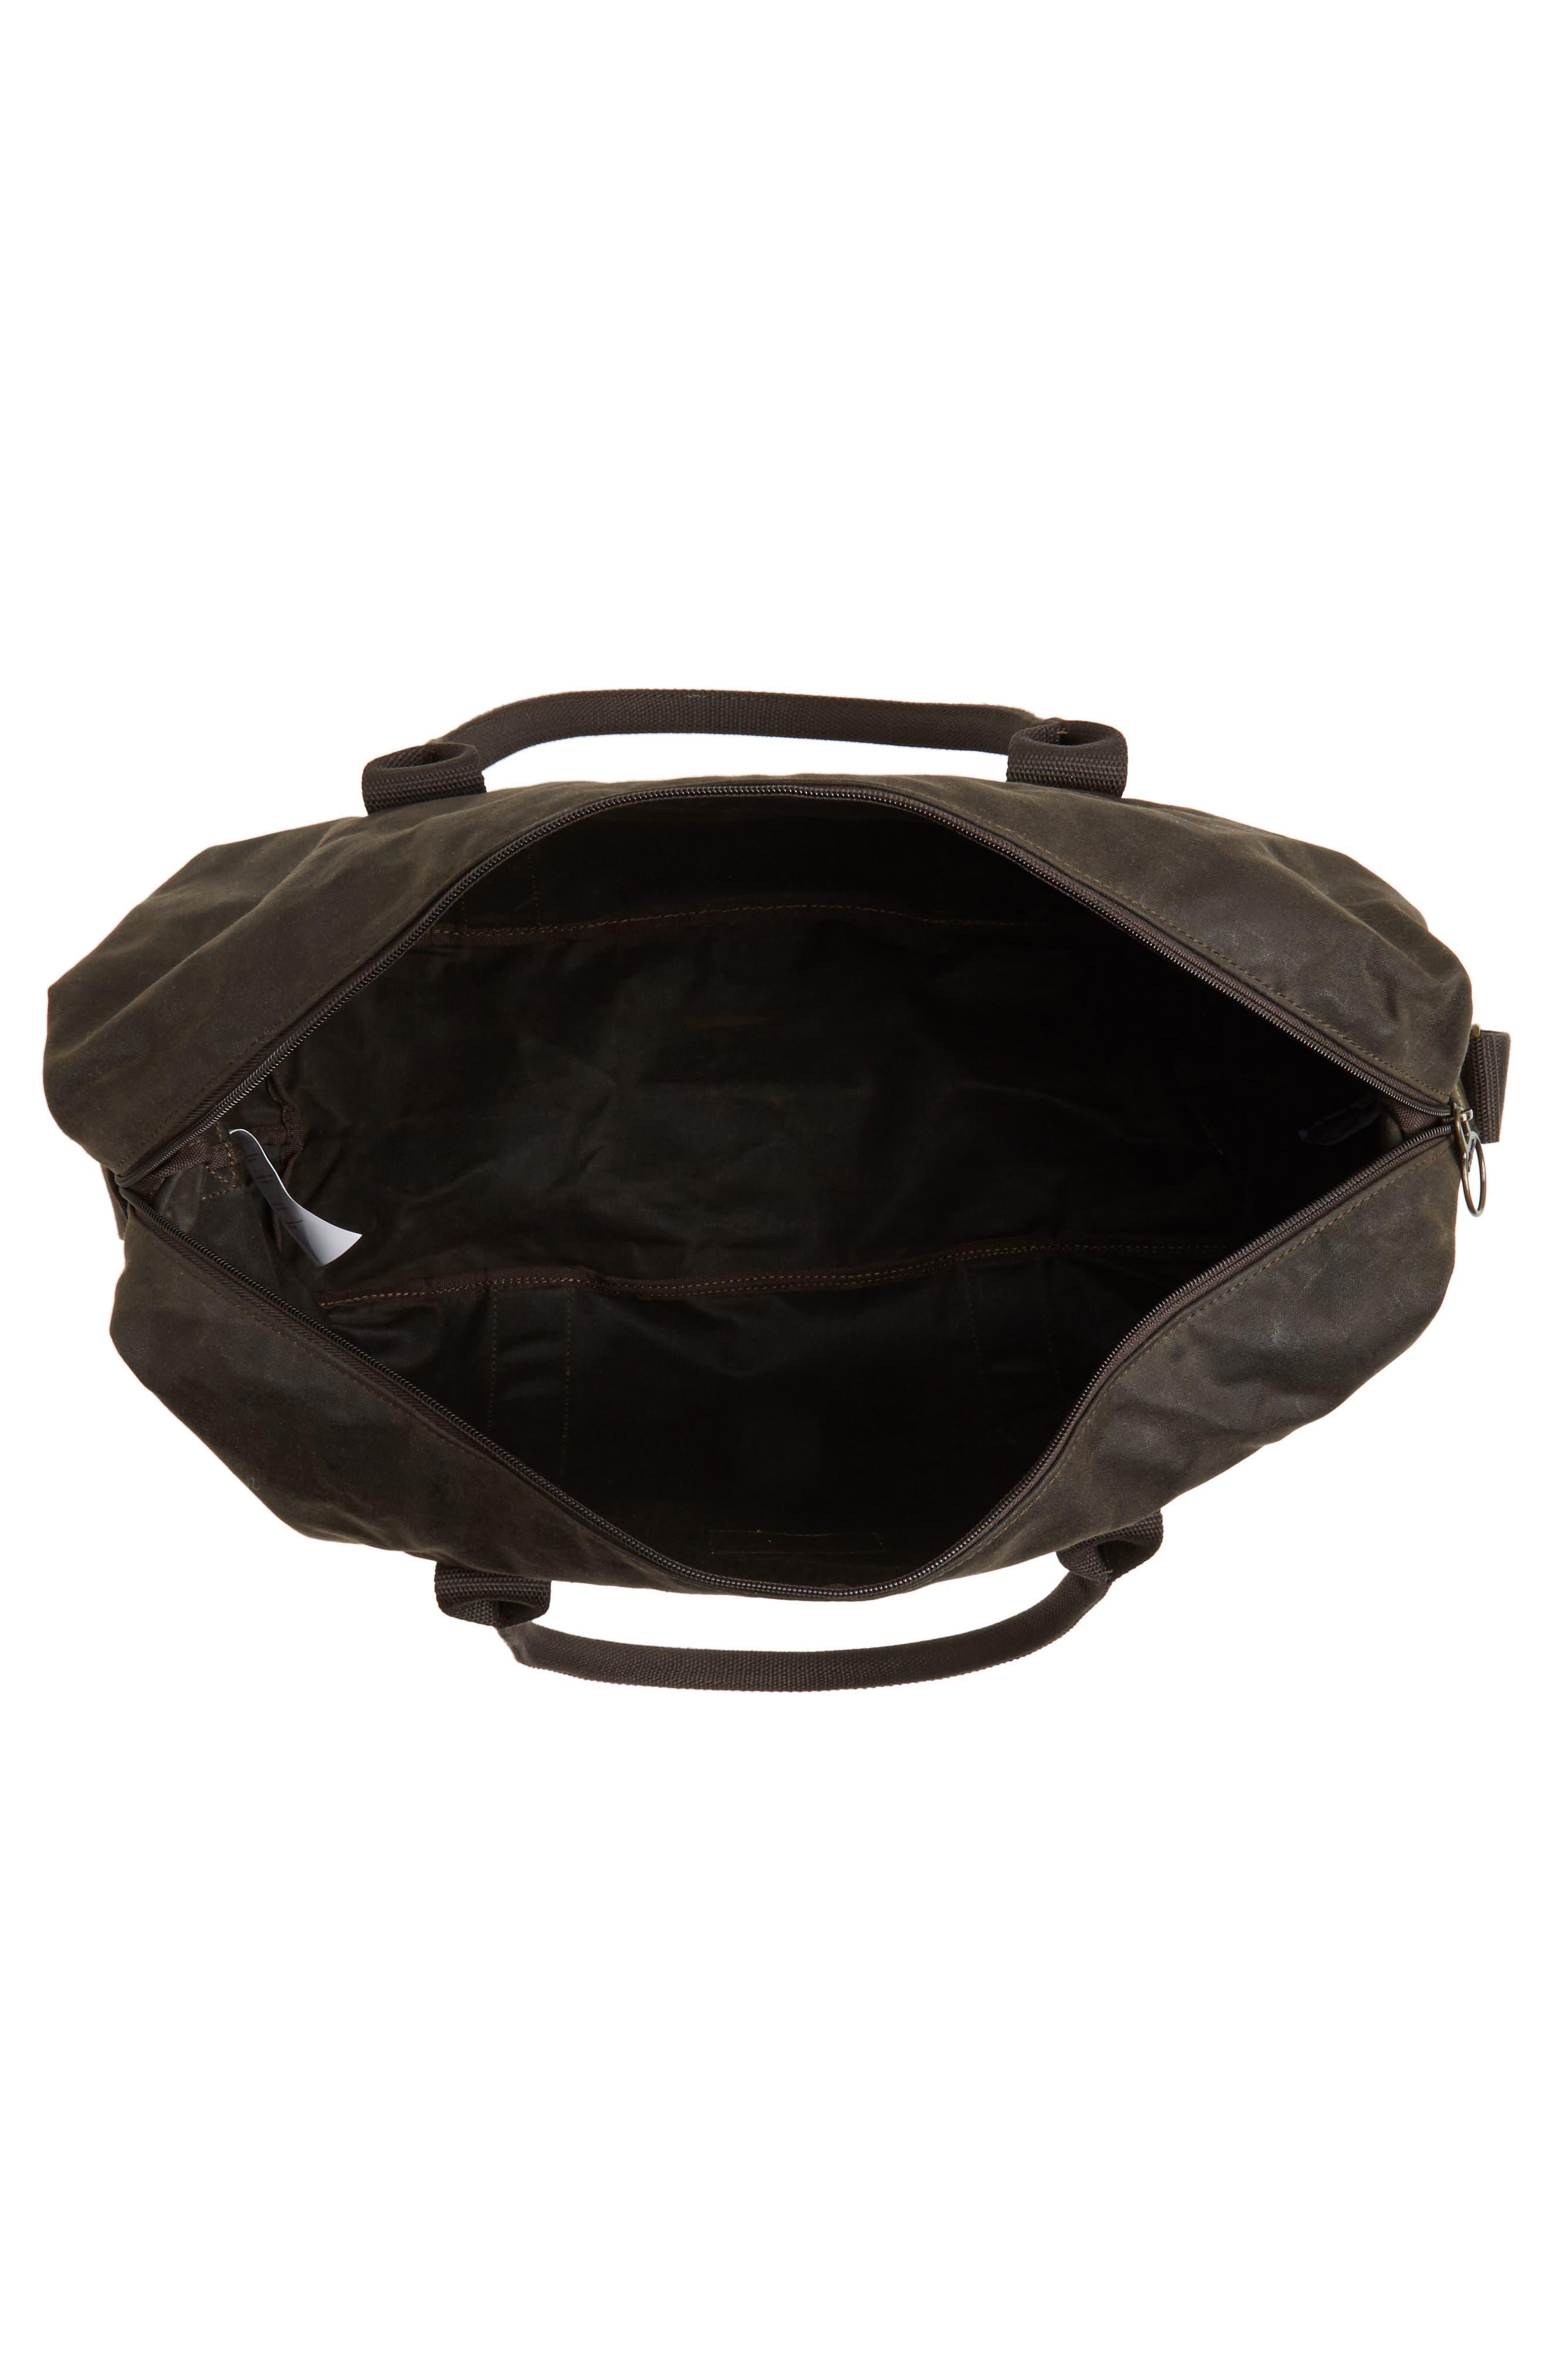 Dromond Canvas Holdall Bag,                             Alternate thumbnail 4, color,                             Olive